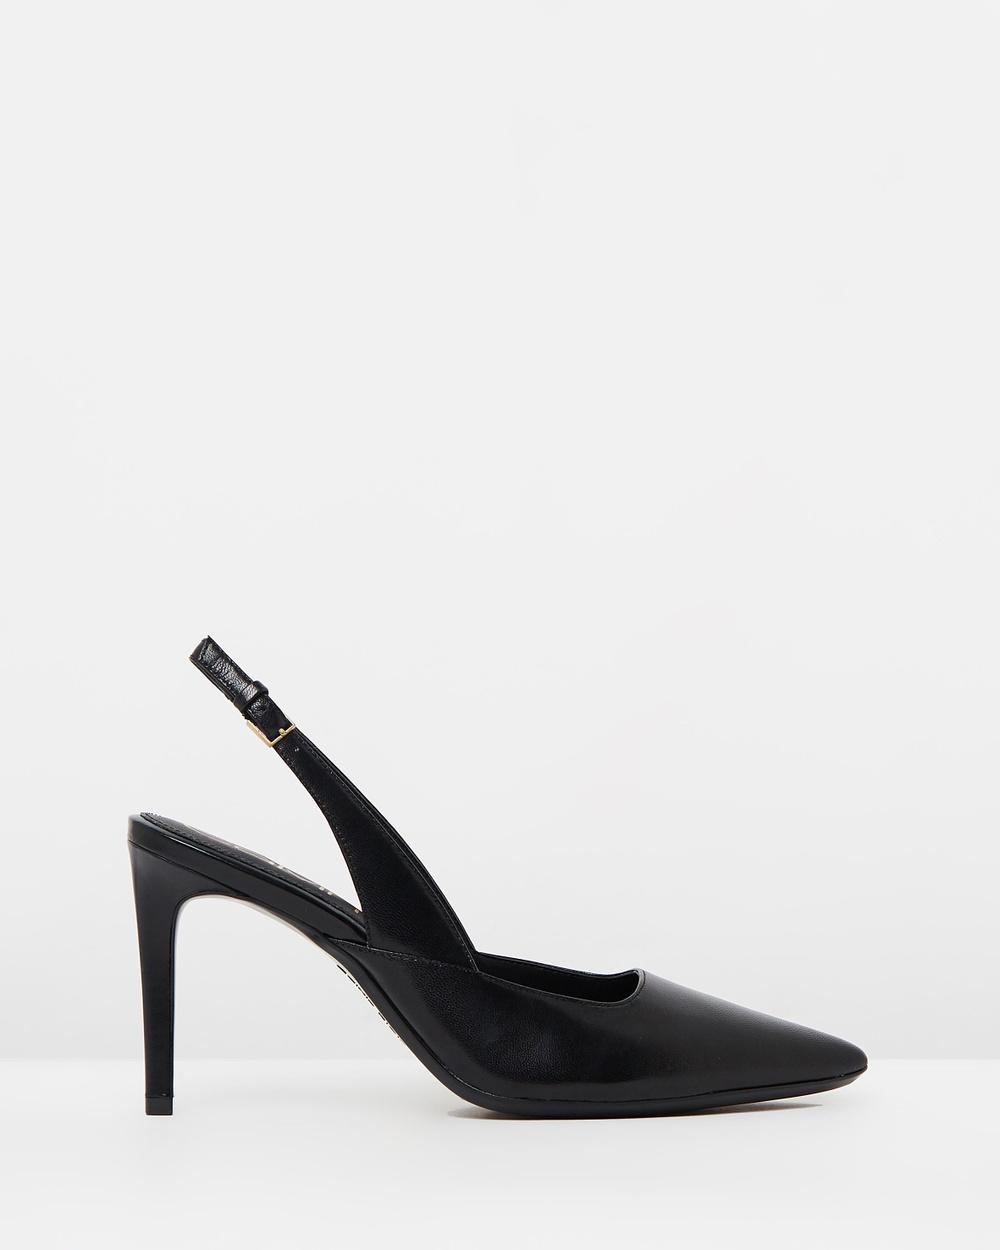 Calvin Klein Rielle All Pumps Black Leather Rielle